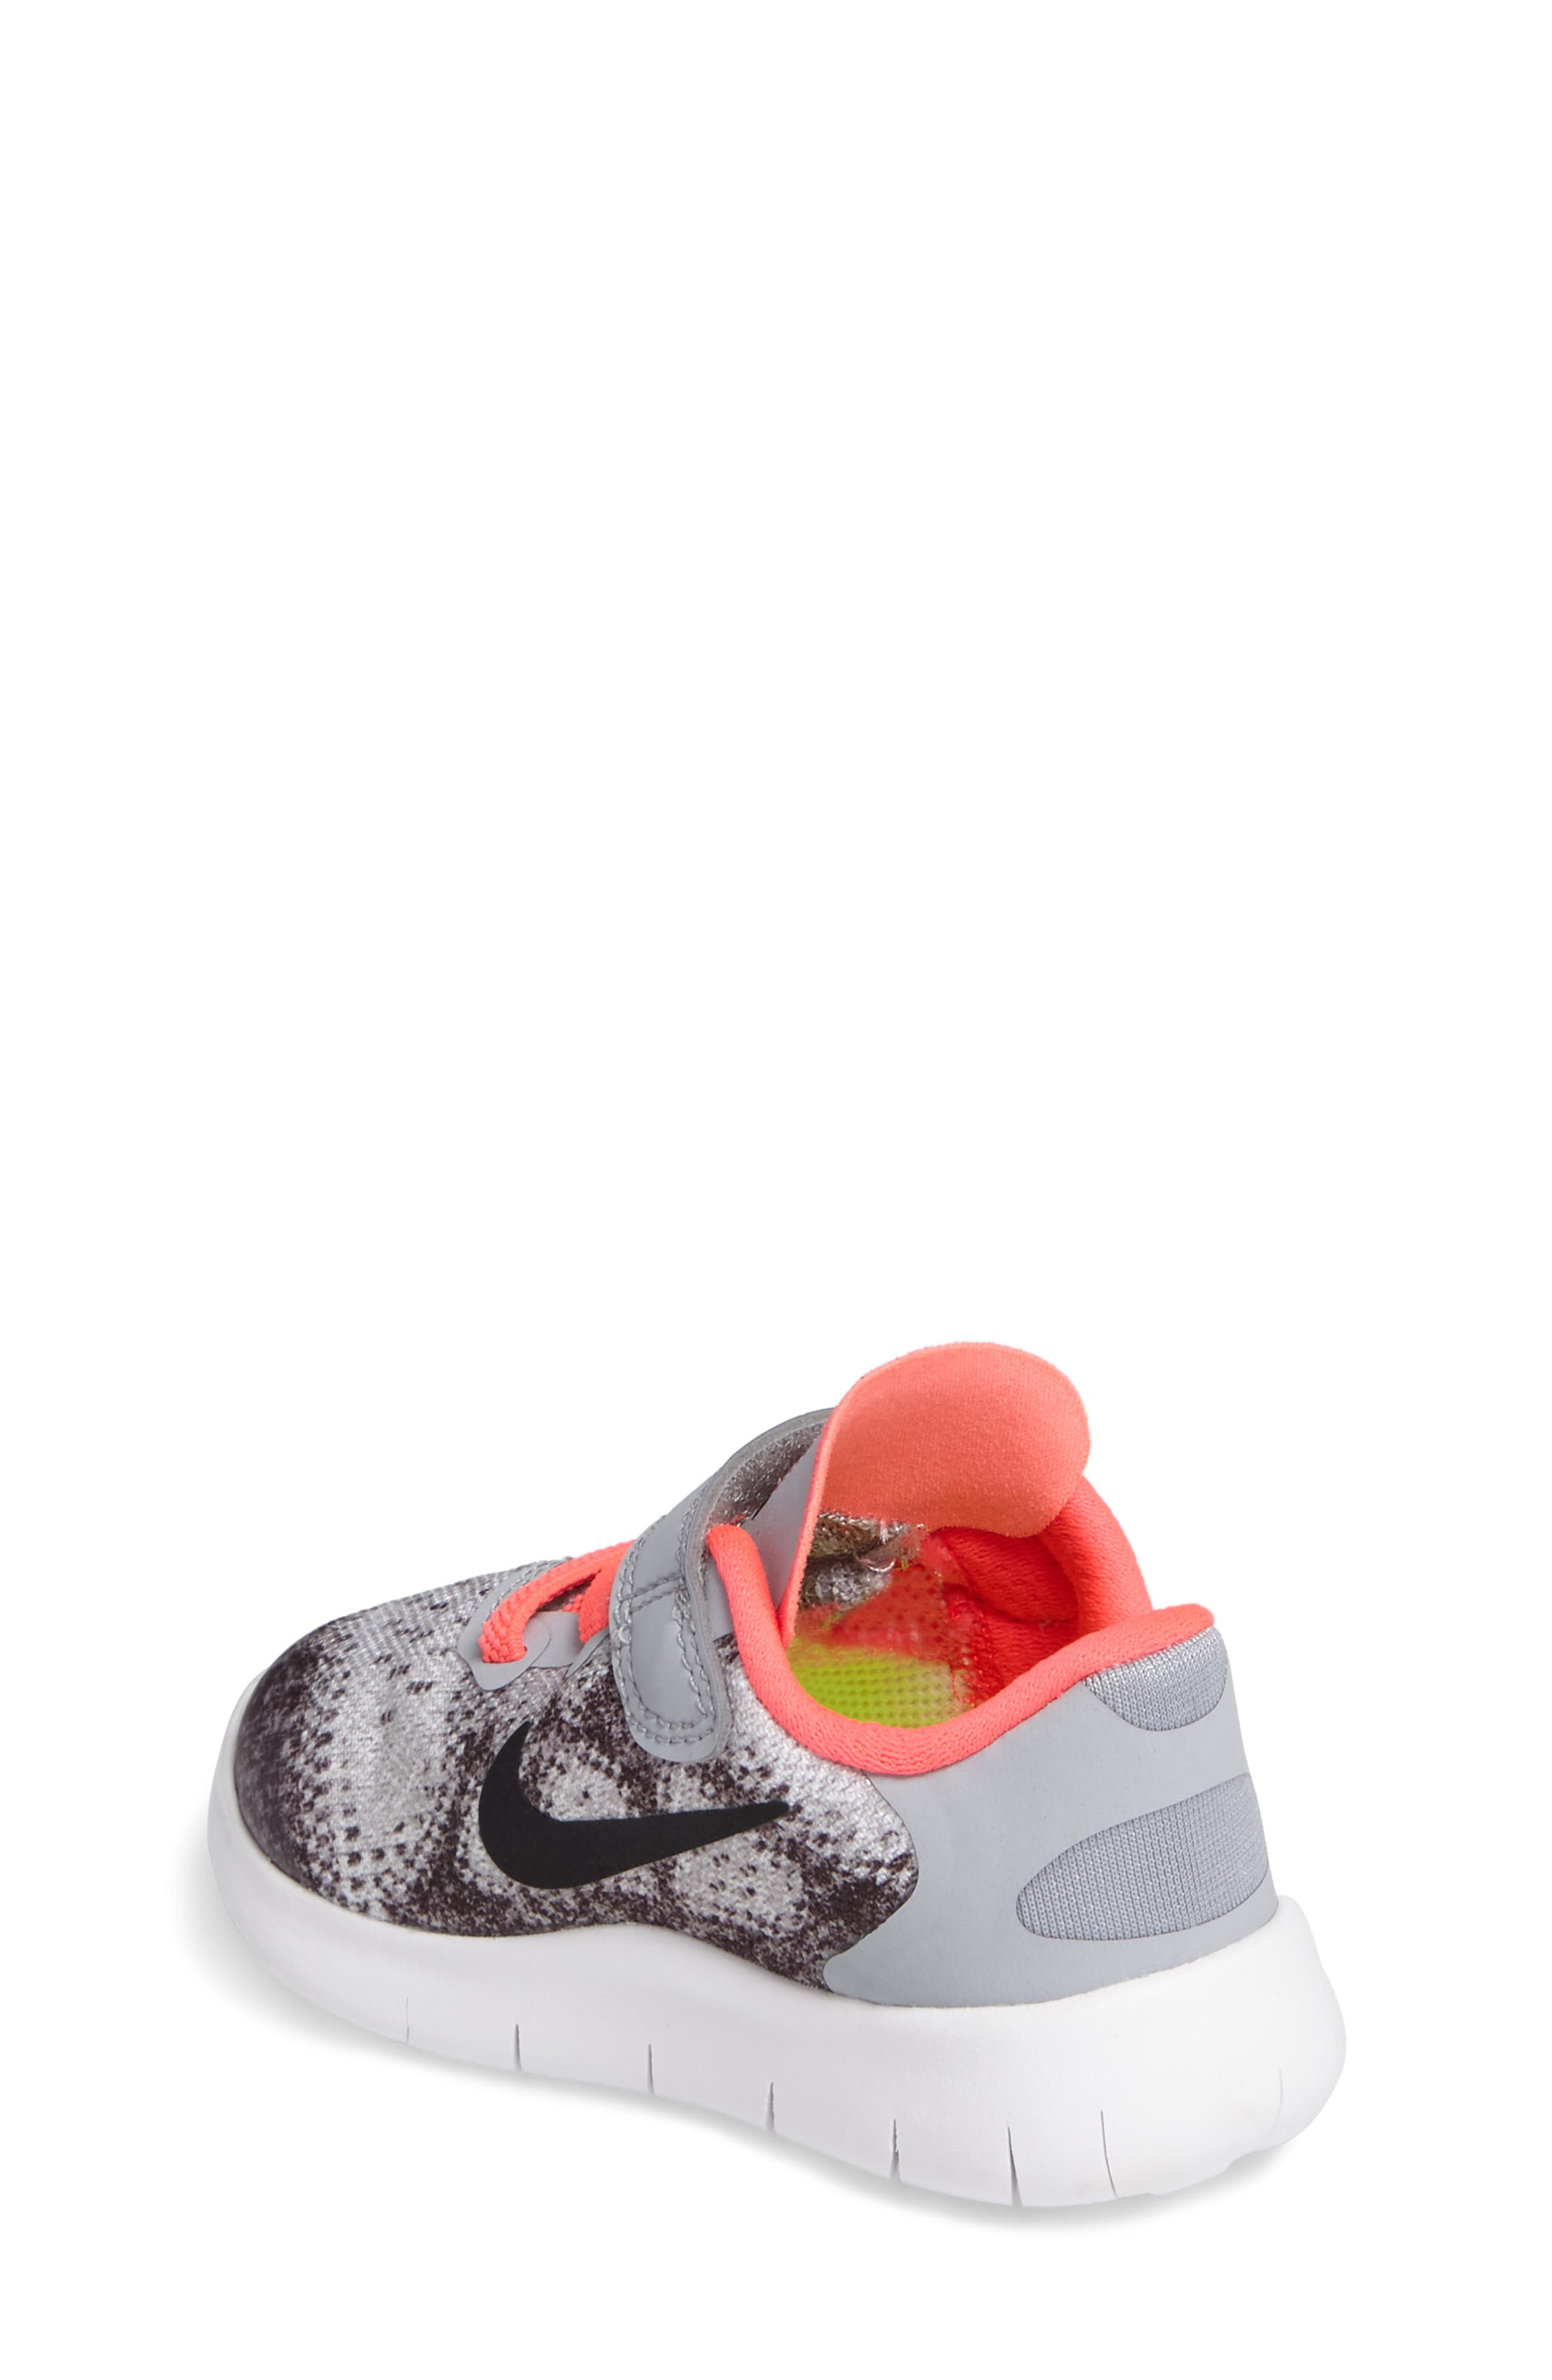 Free Run 2017 Sneaker,                             Alternate thumbnail 2, color,                             020